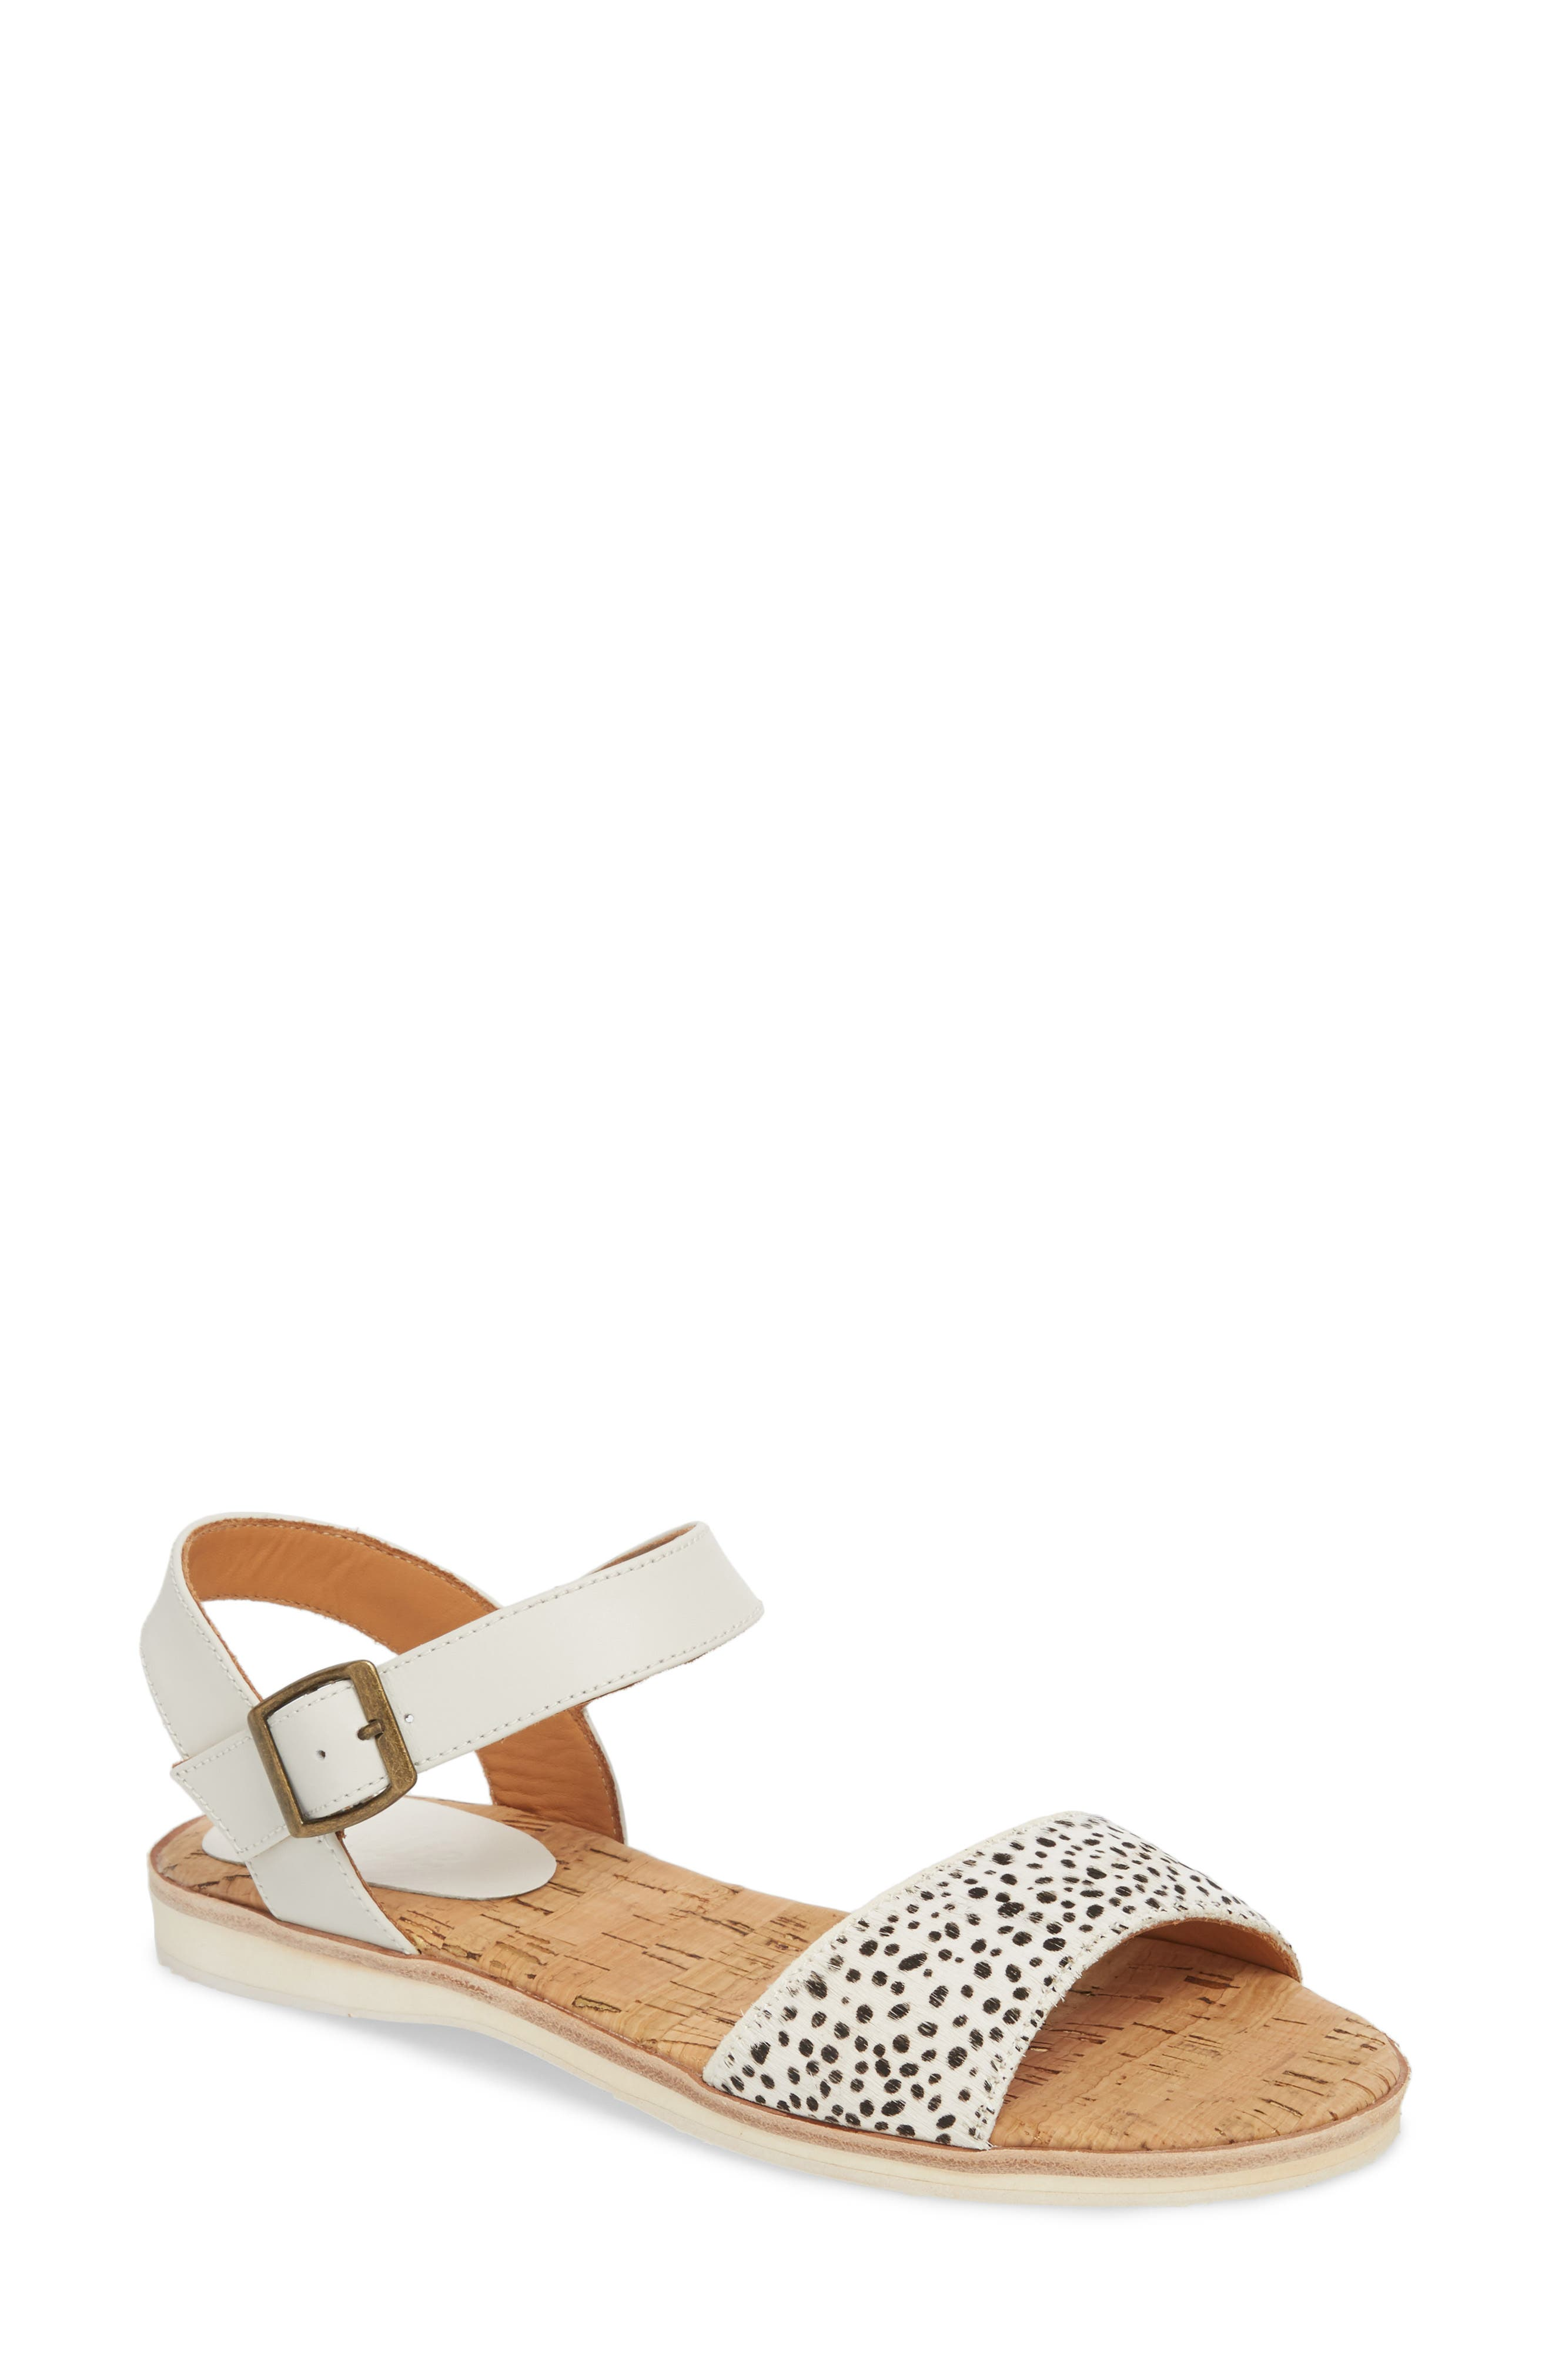 Genuine Calf Hair Sandal,                             Main thumbnail 1, color,                             Snow Leopard/ White Leather